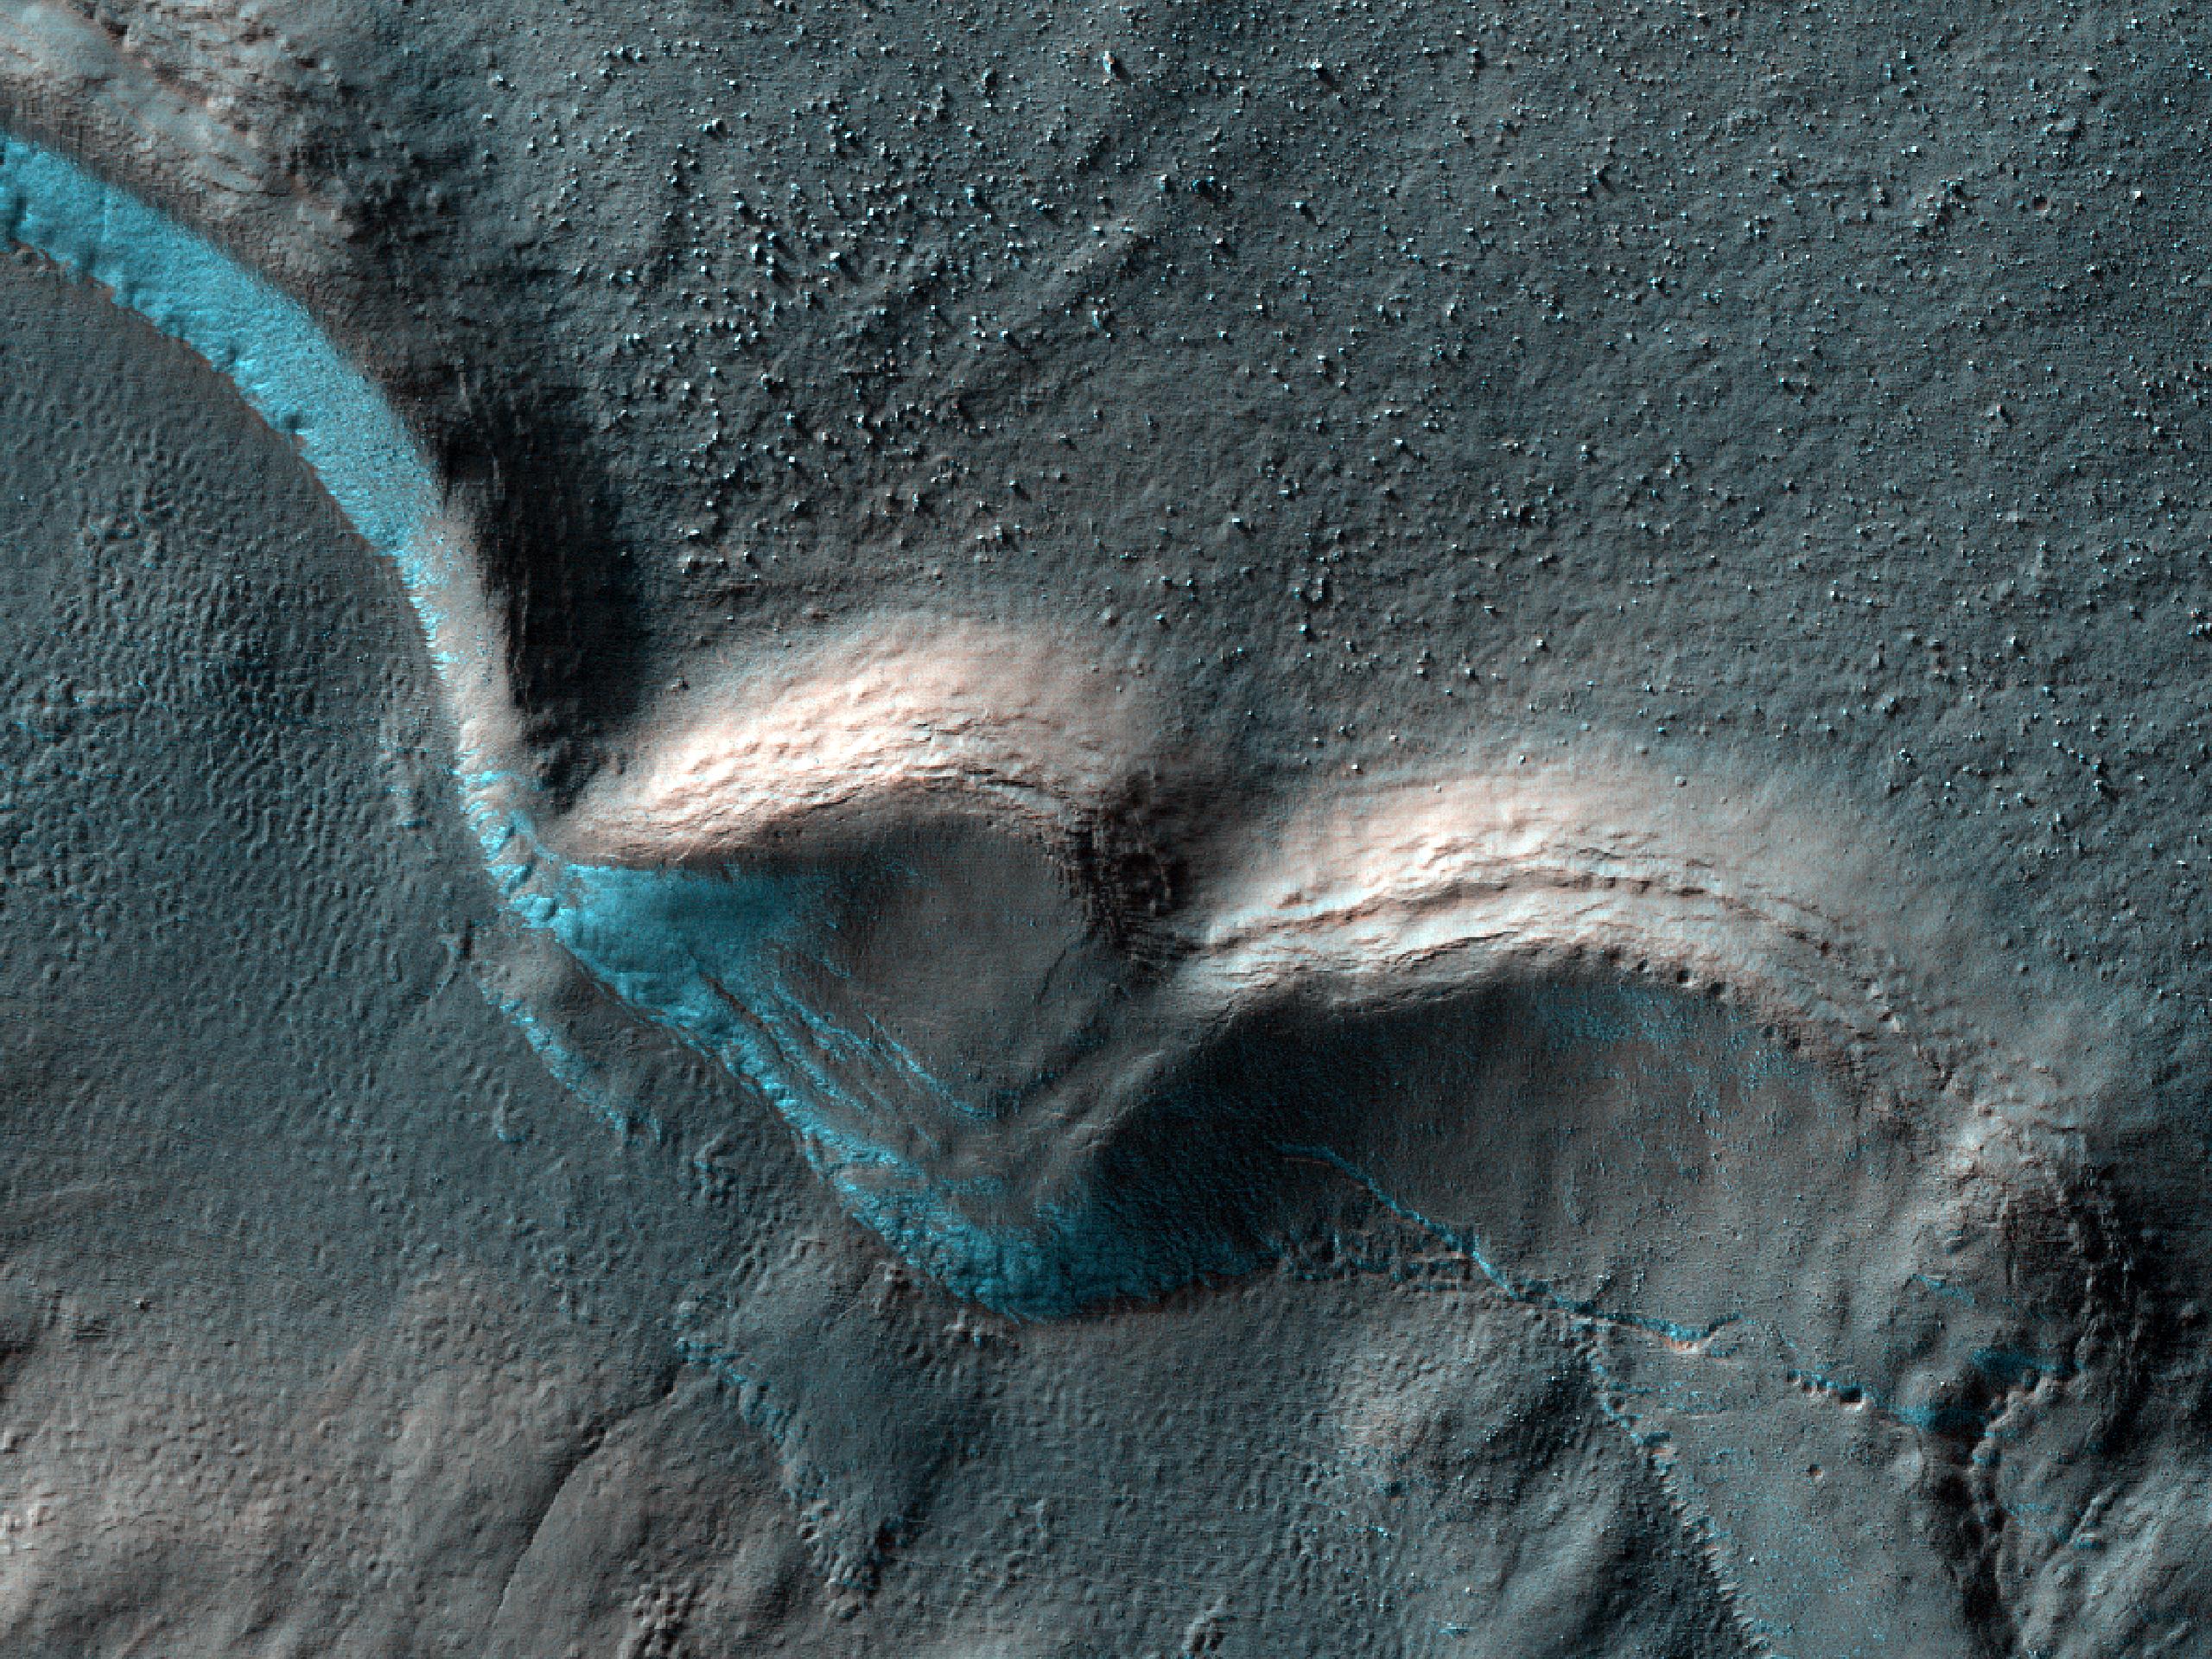 Layered Ridges at the Base of Gullies